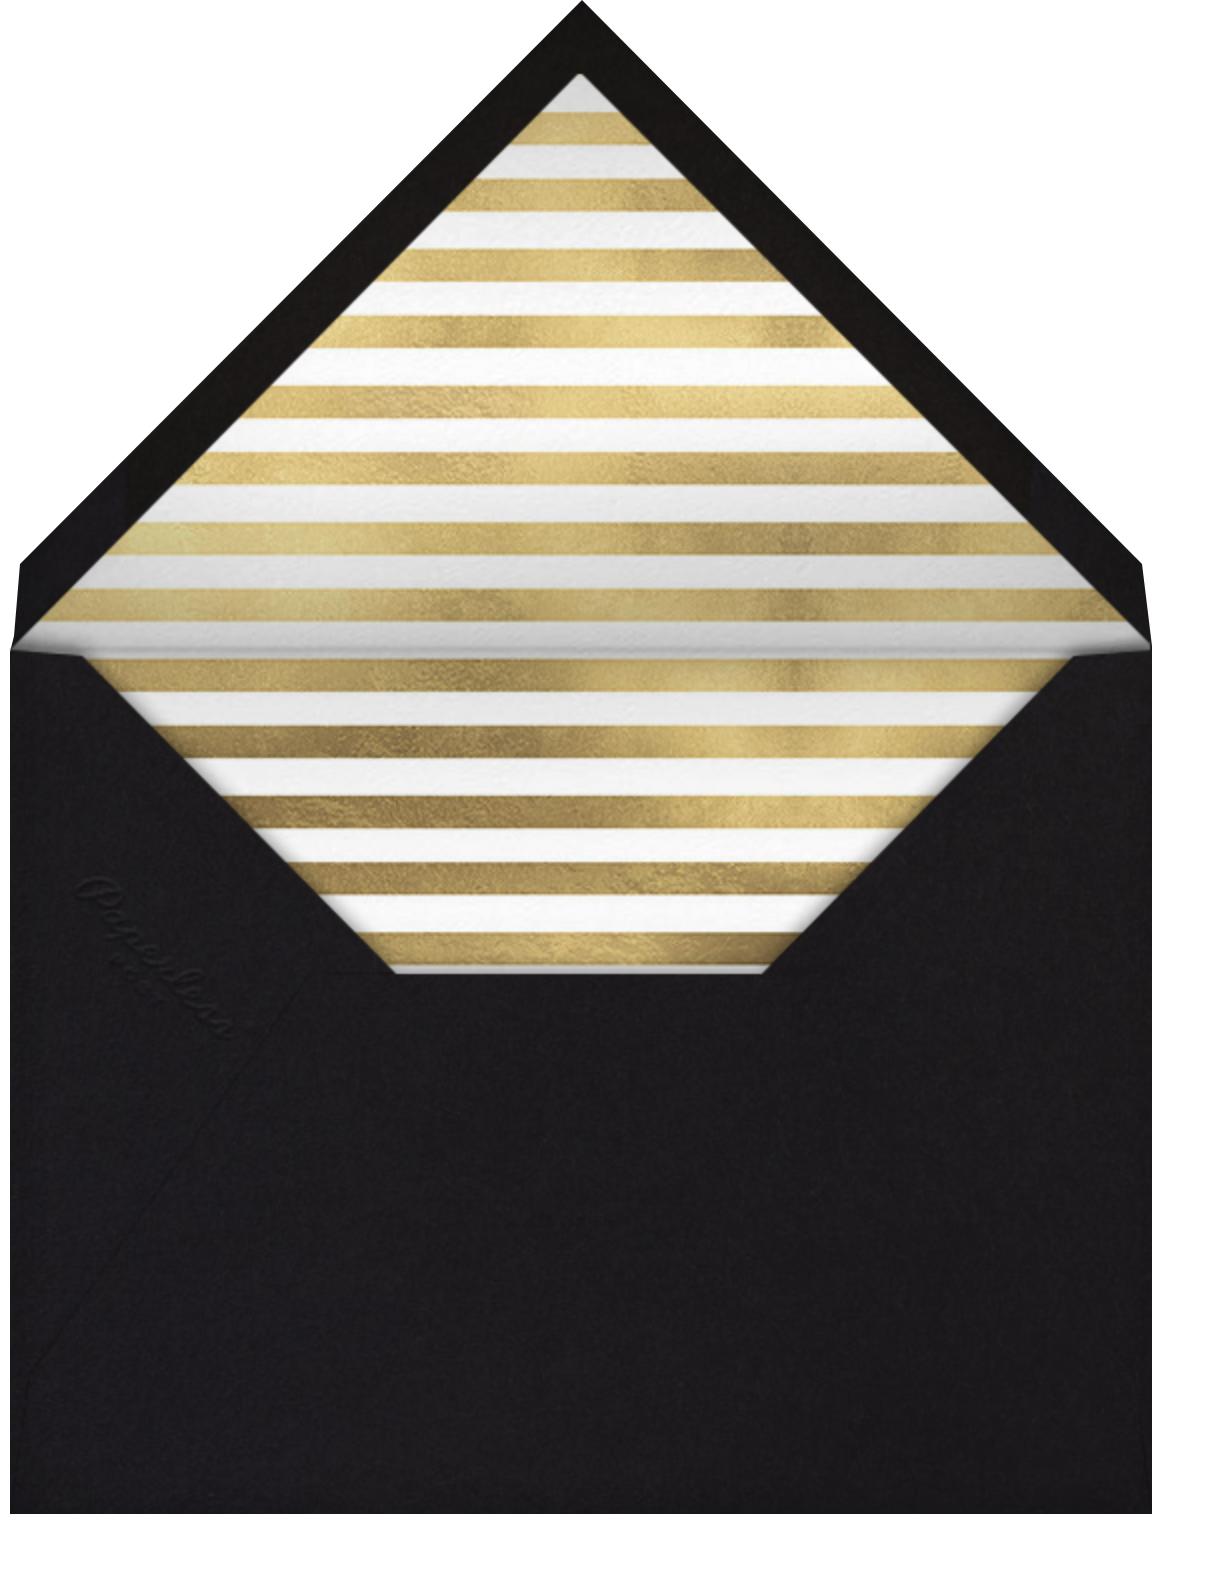 Orchid Shower (Square) - Black - kate spade new york - Birthday - envelope back